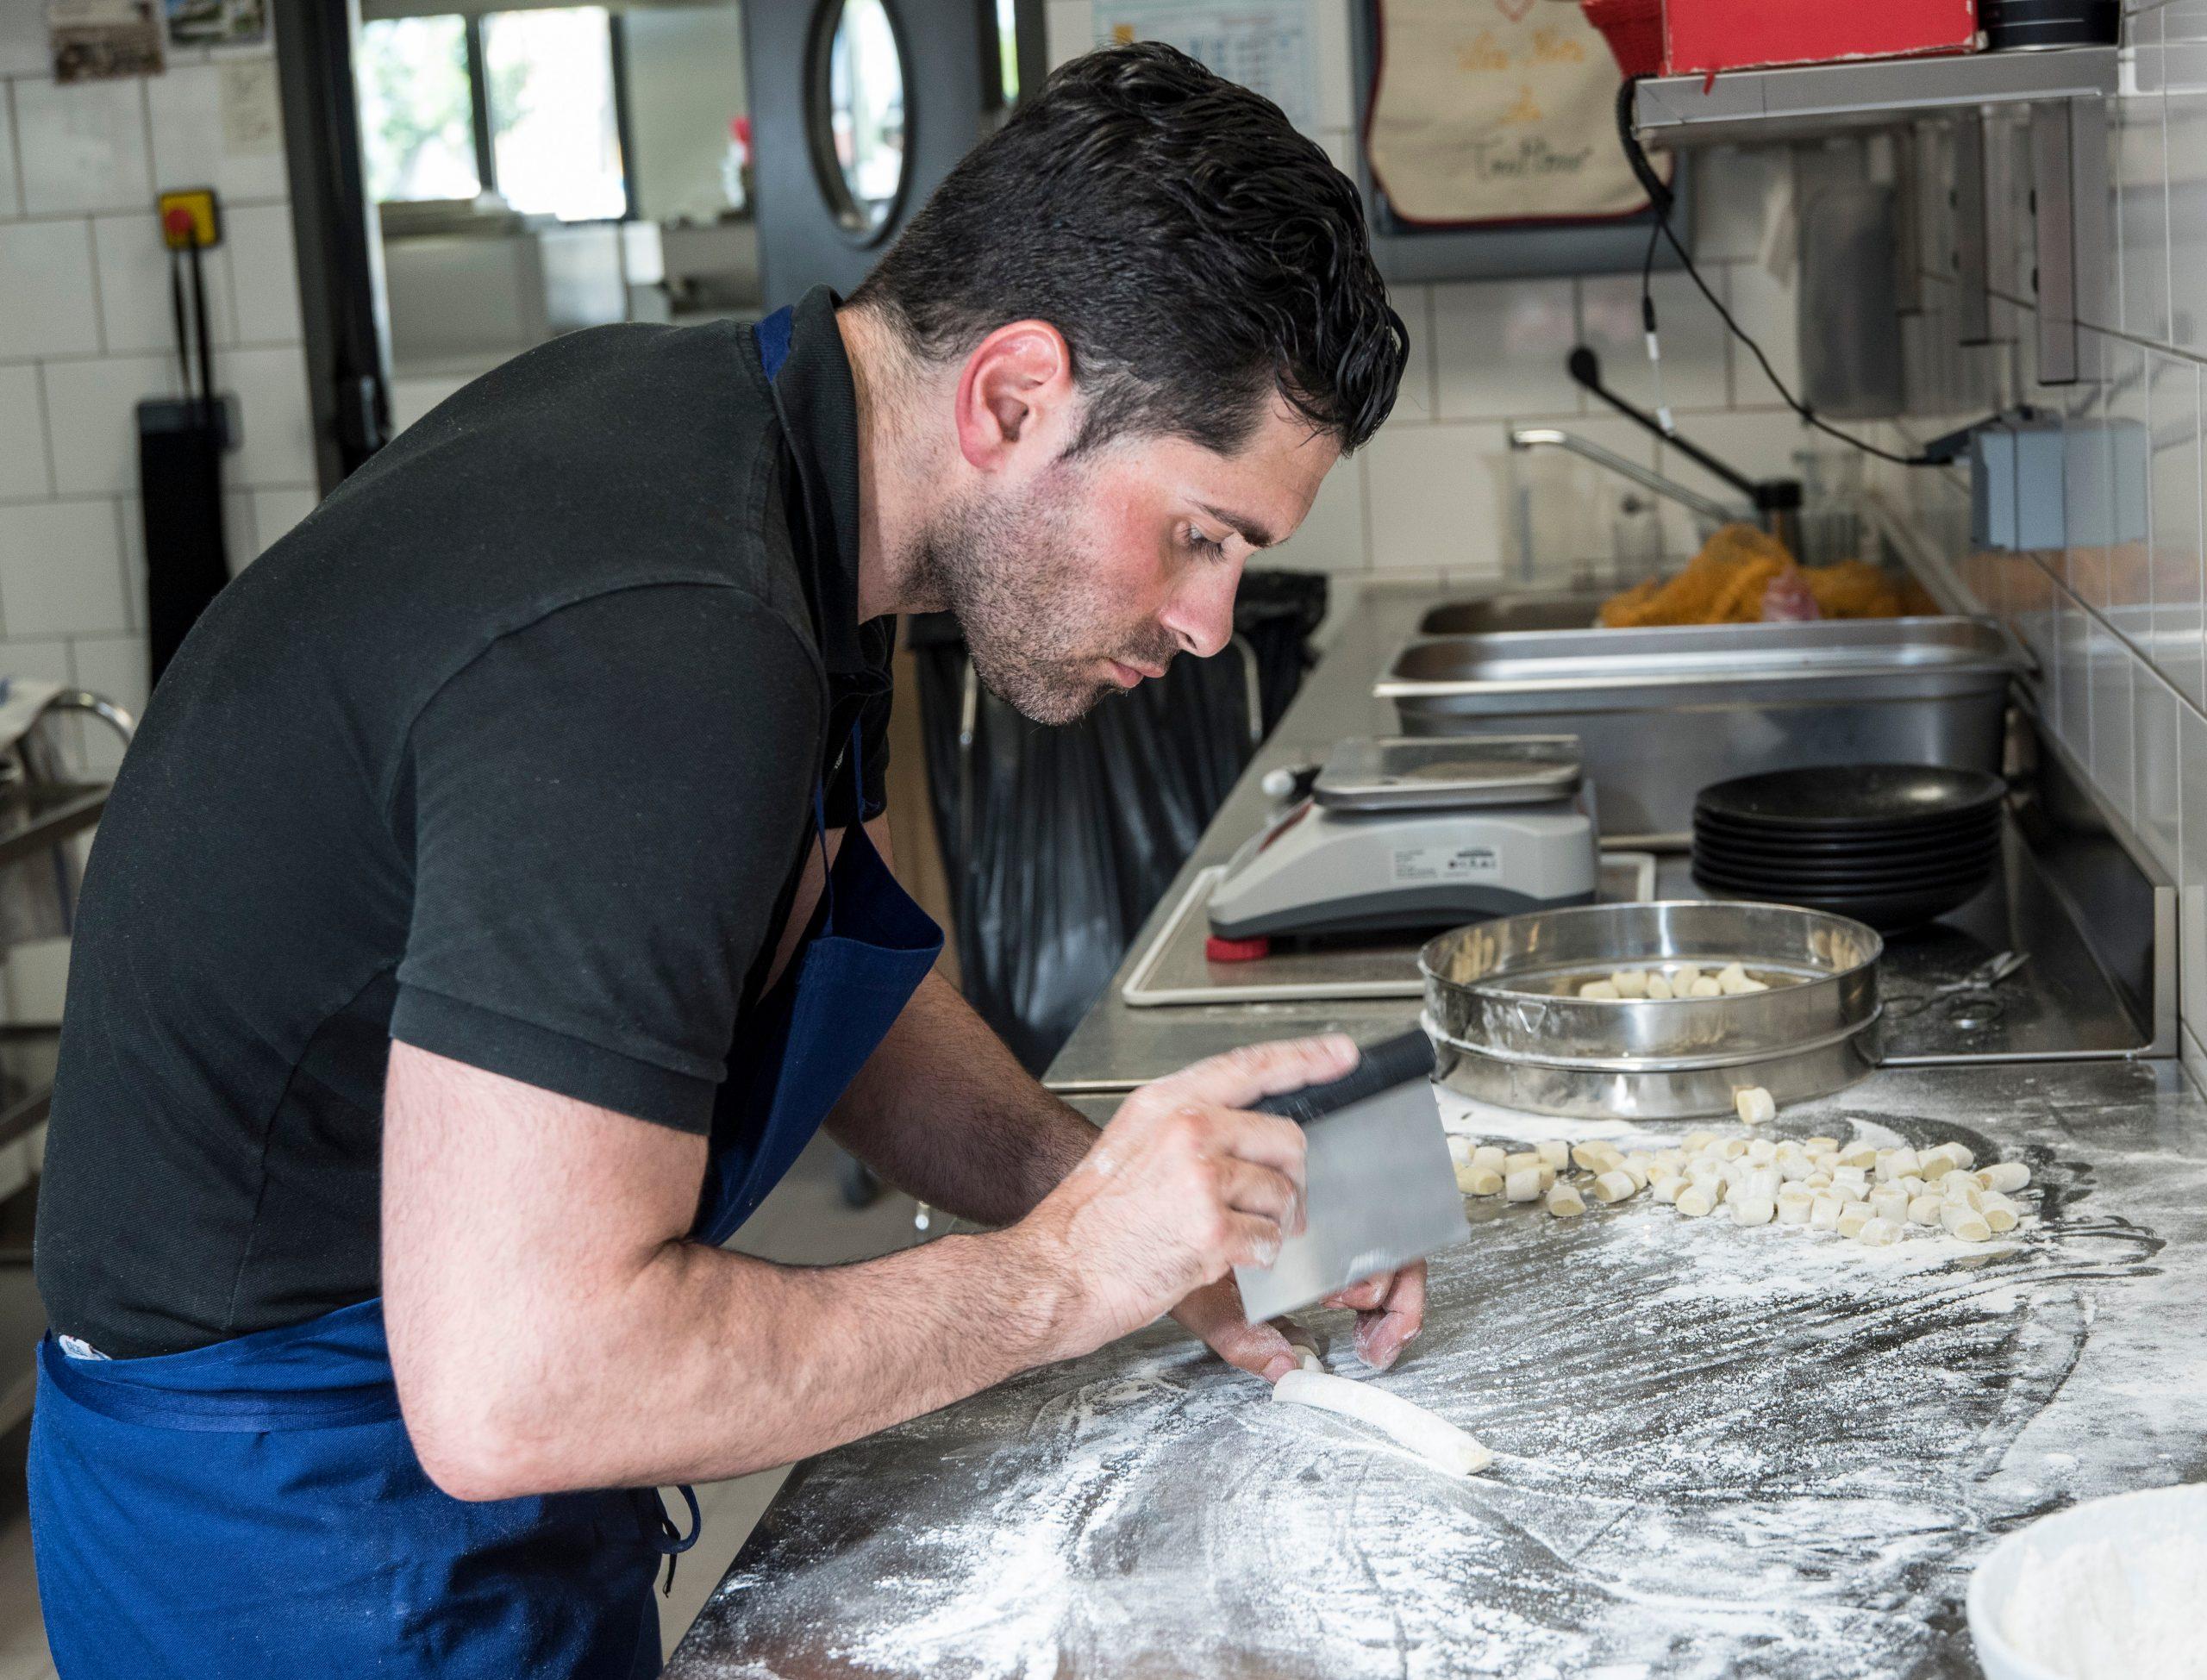 Cuisine faite maison : la Golden Rule de Trattino !